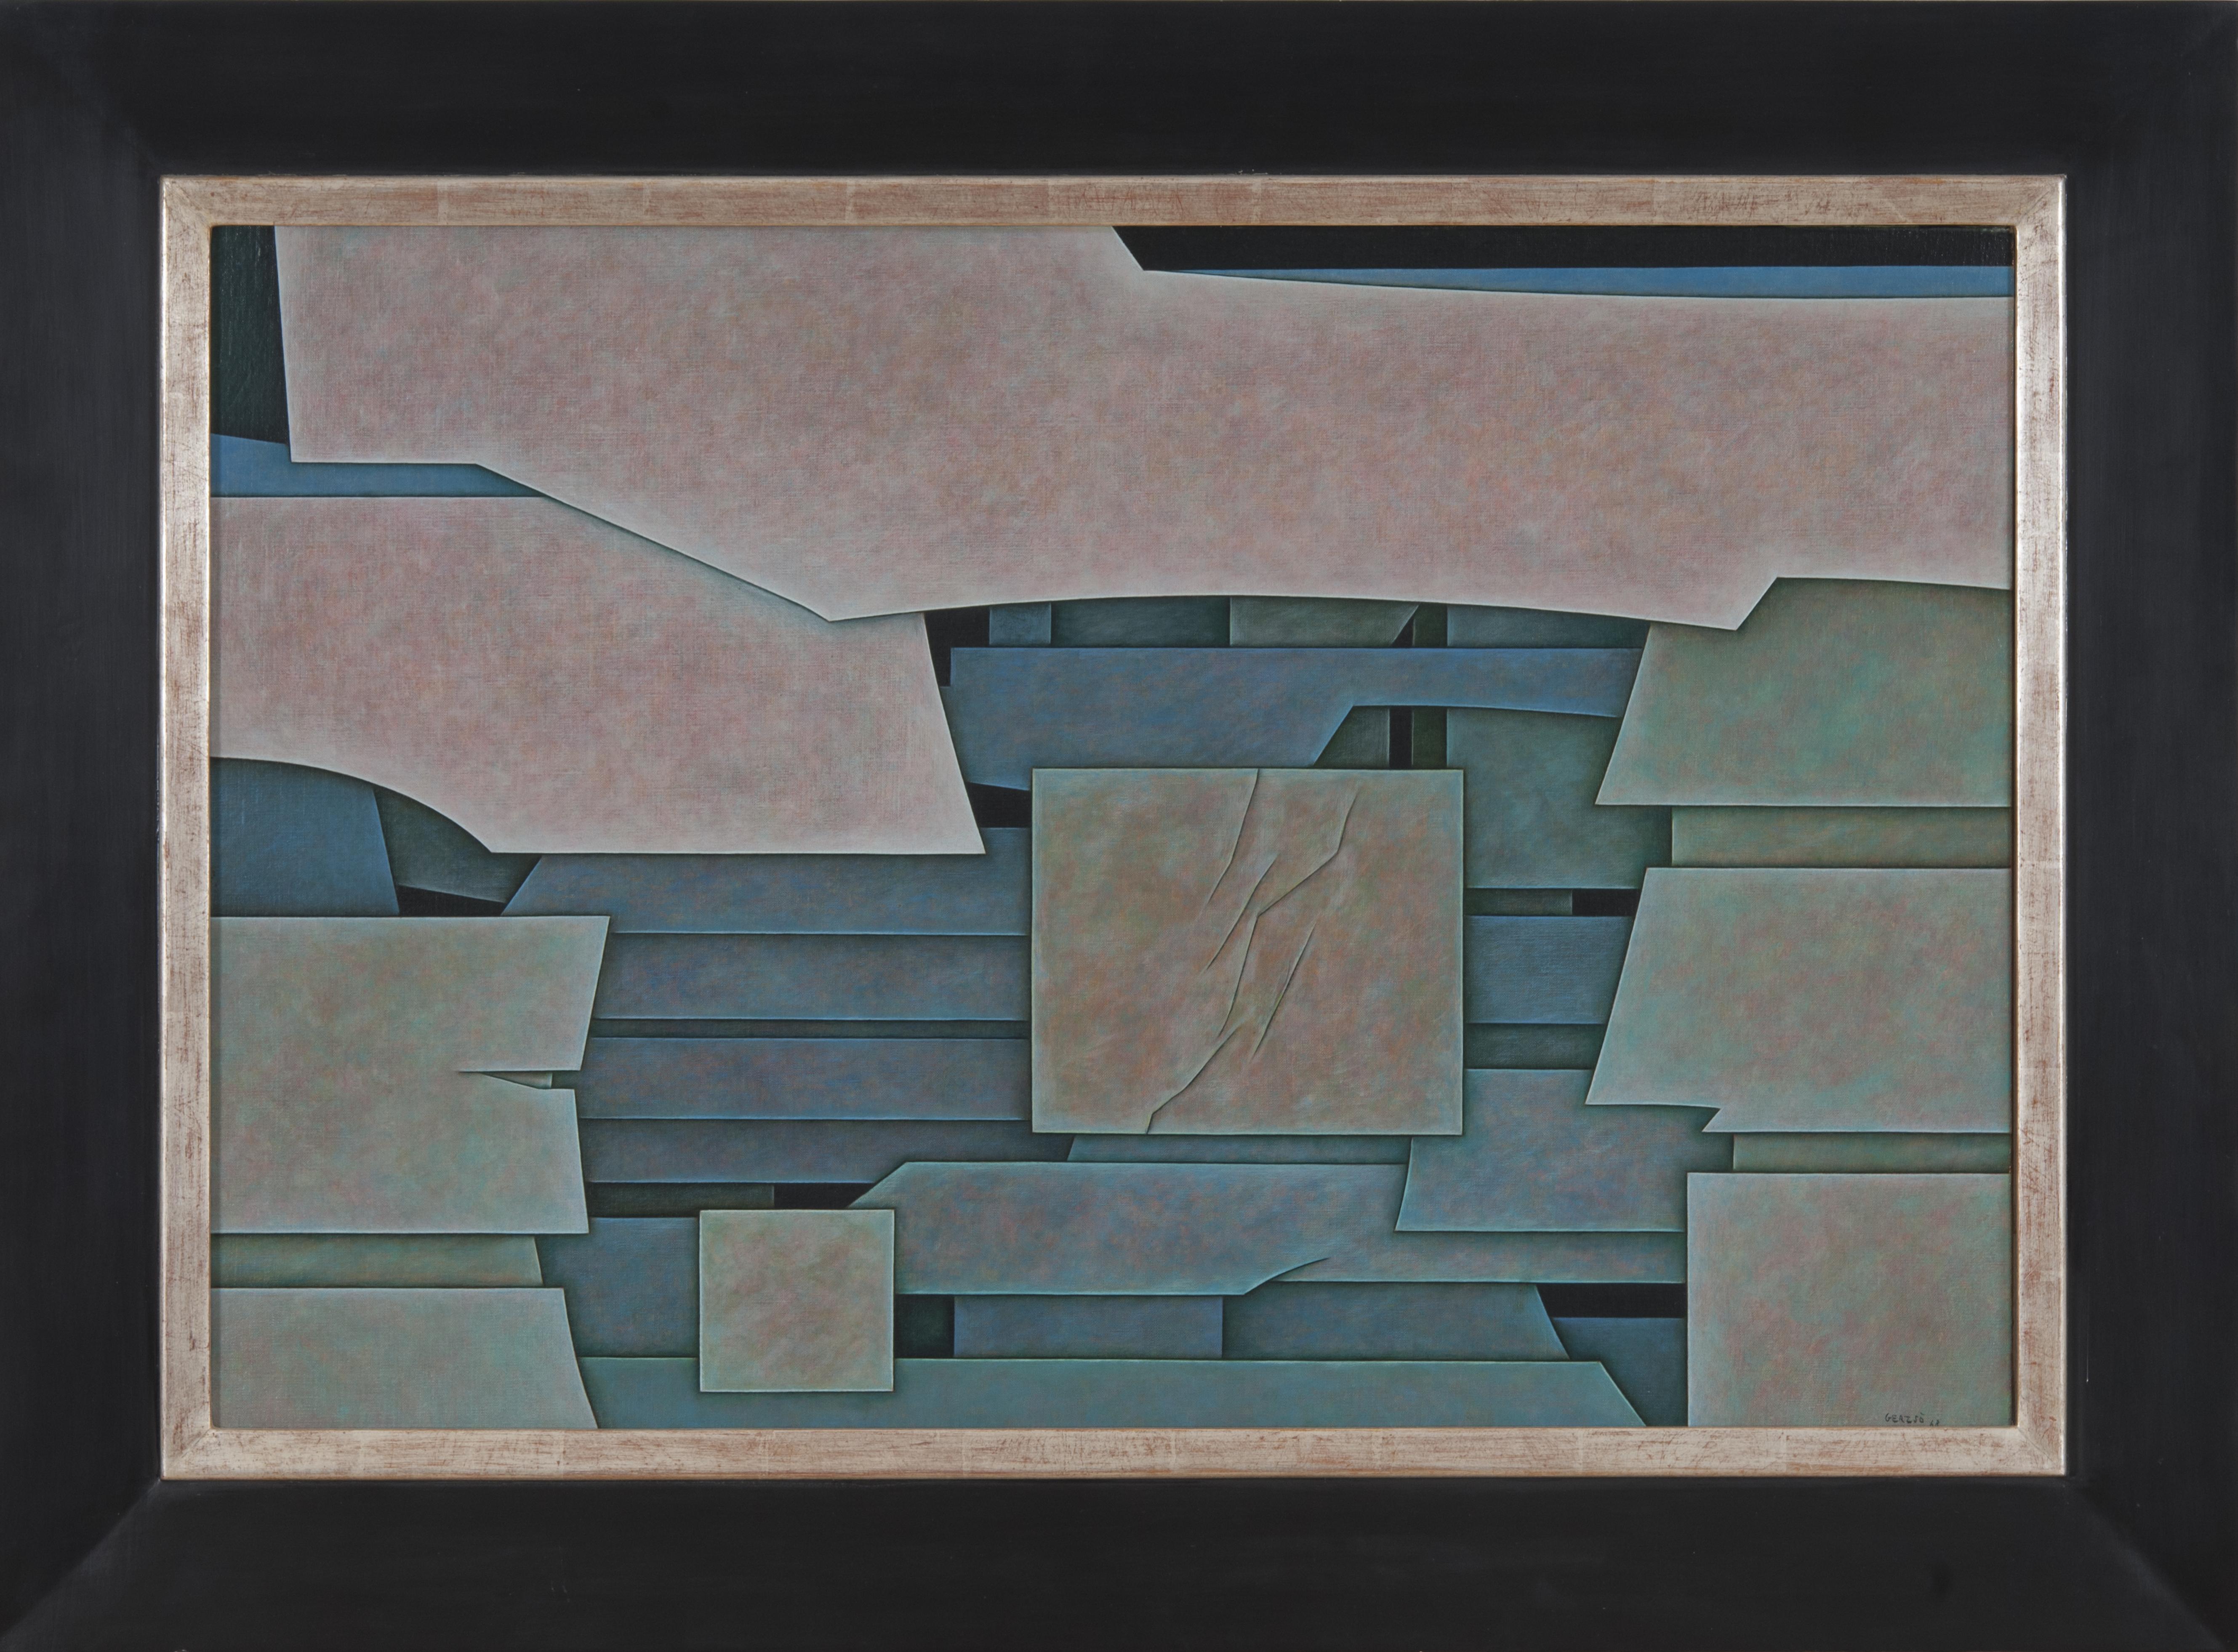 gerzso-paisaje-azul-verde-1968